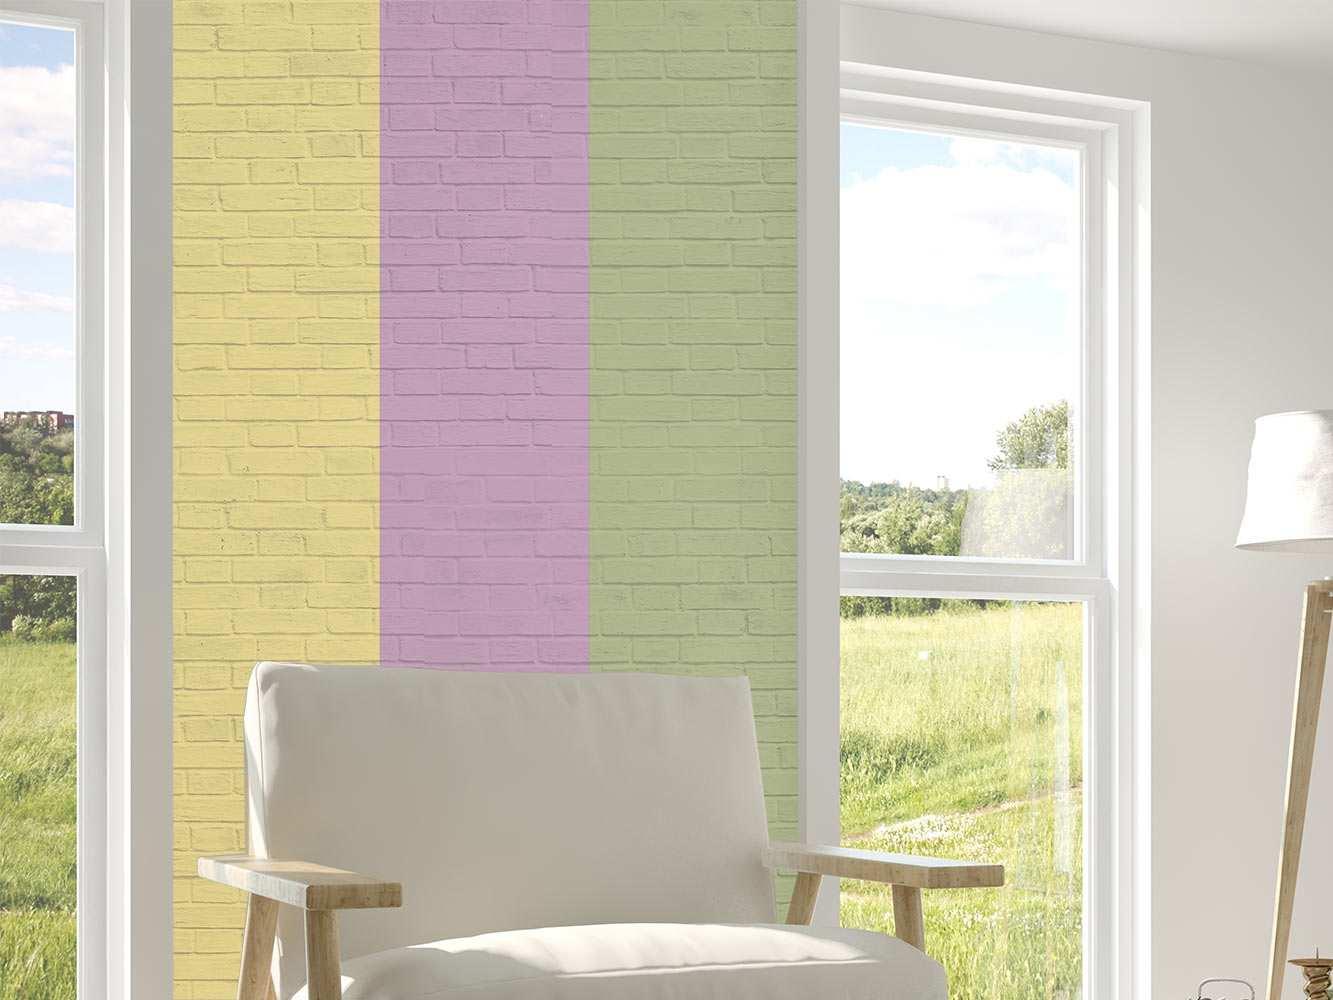 Cenefa Vertical Papel Pintado Ladrillos Multicolor | Carteles XXL - Impresión carteleria publicitaria